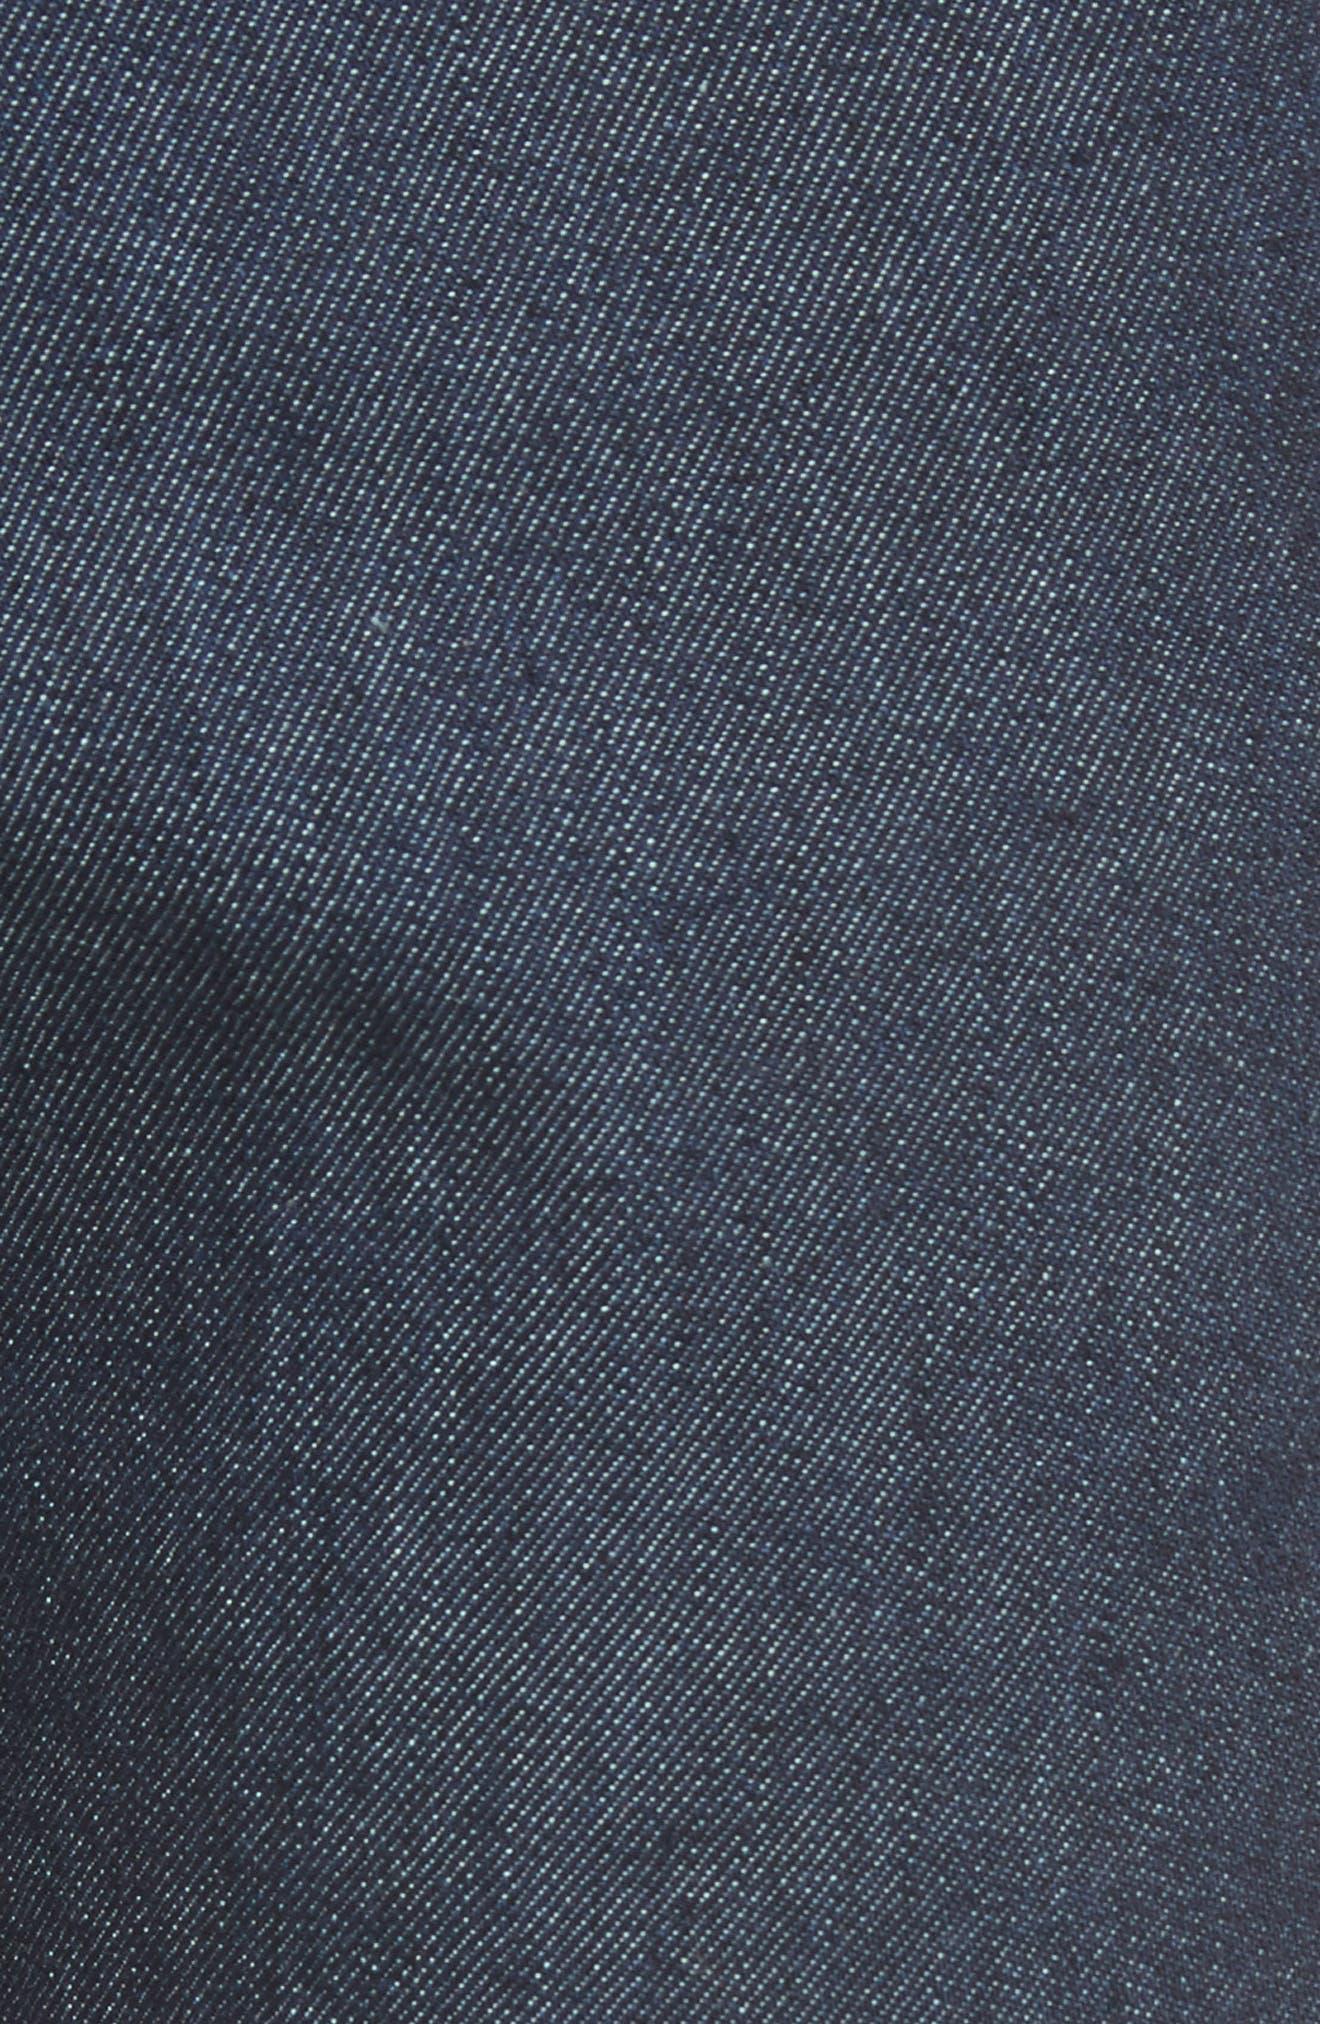 Skinny Fit Jeans,                             Alternate thumbnail 5, color,                             491